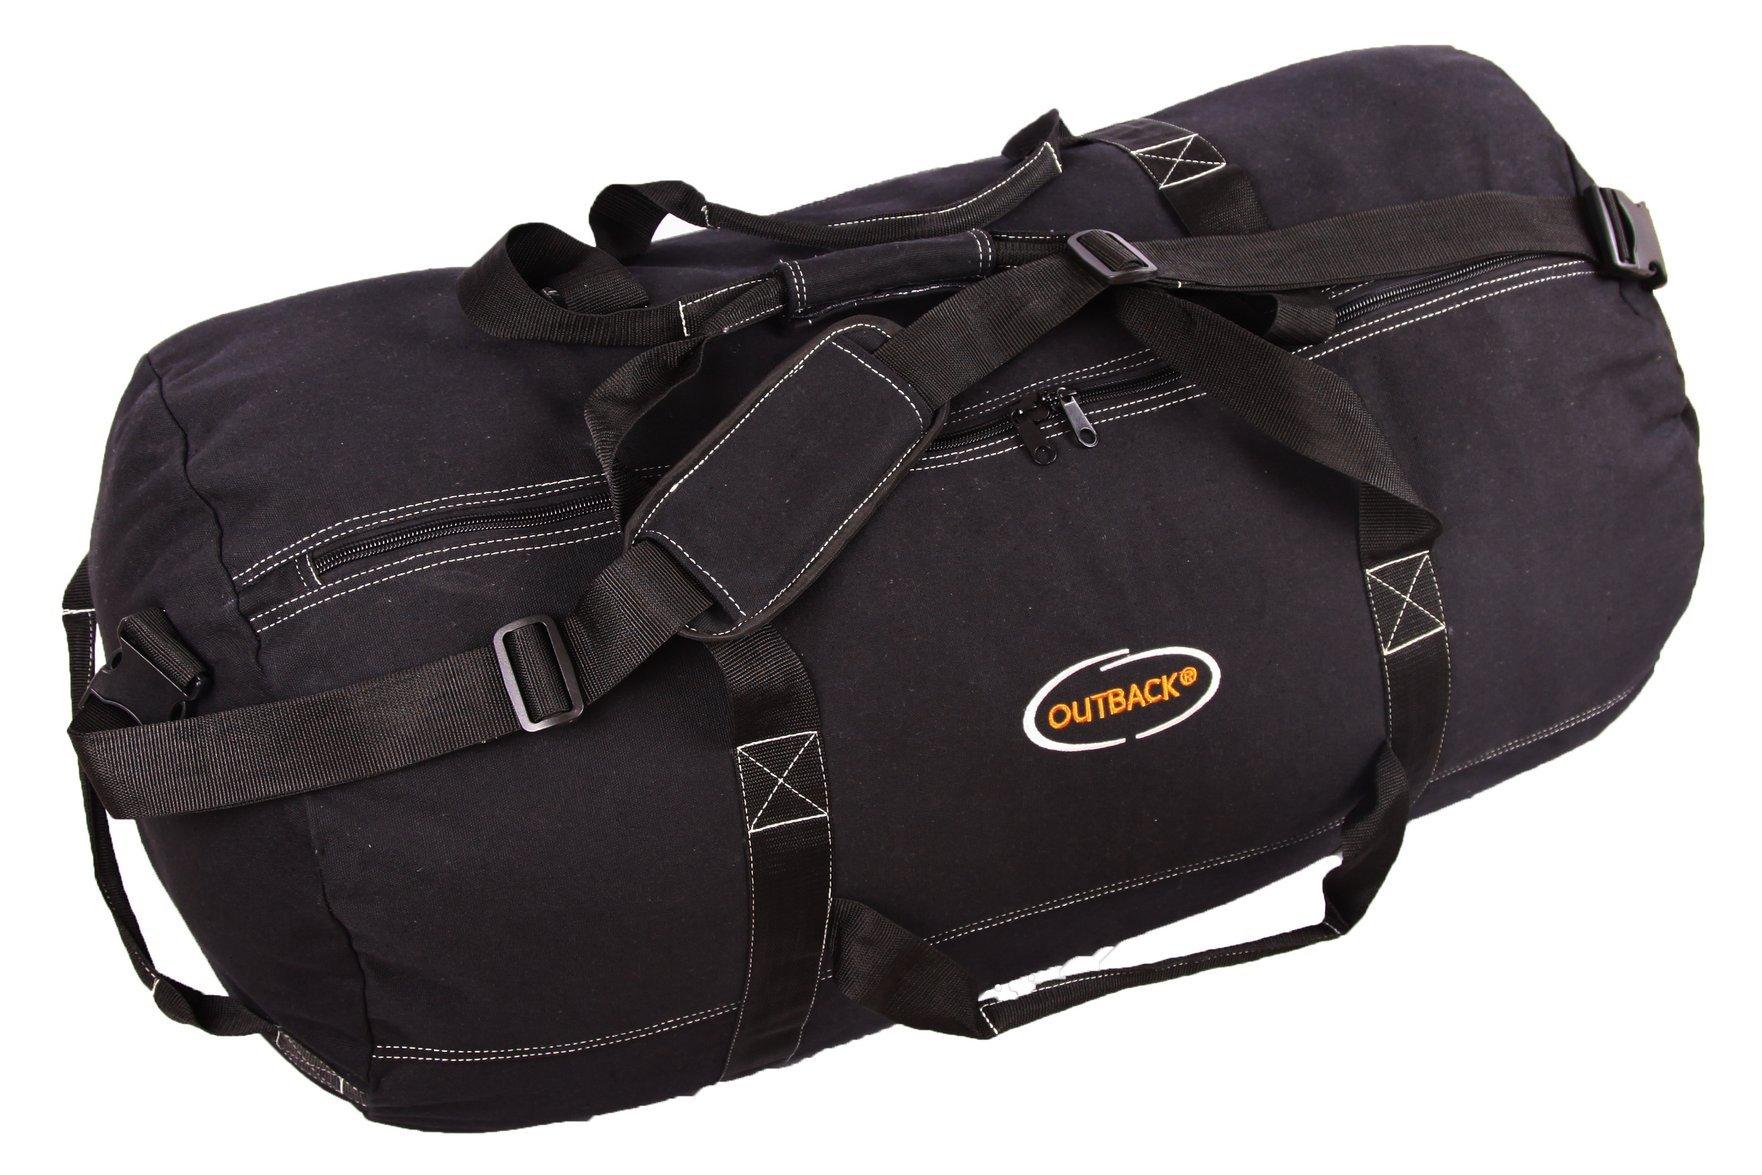 Ledmark Super Tough Heavyweight Cotton Canvas Duffle Bag, Black, Size XL, 36'' x 20''